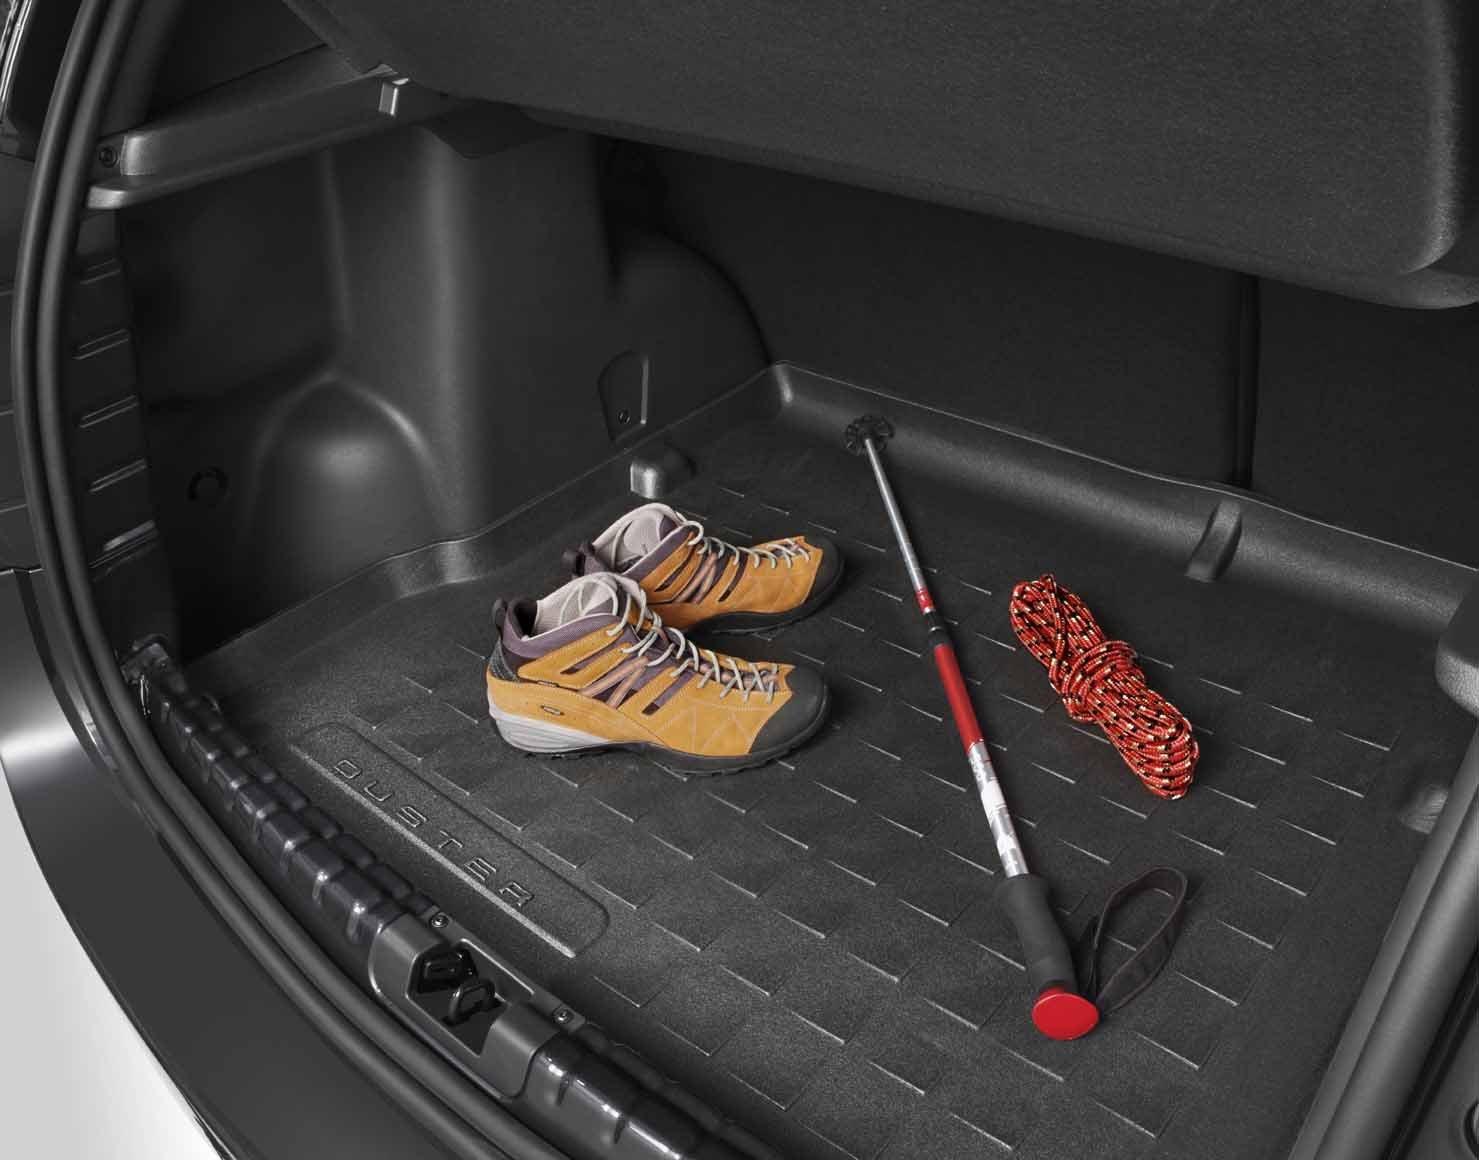 4x2 Original Bandeja para maletero de Dacia Duster I 2010-2017